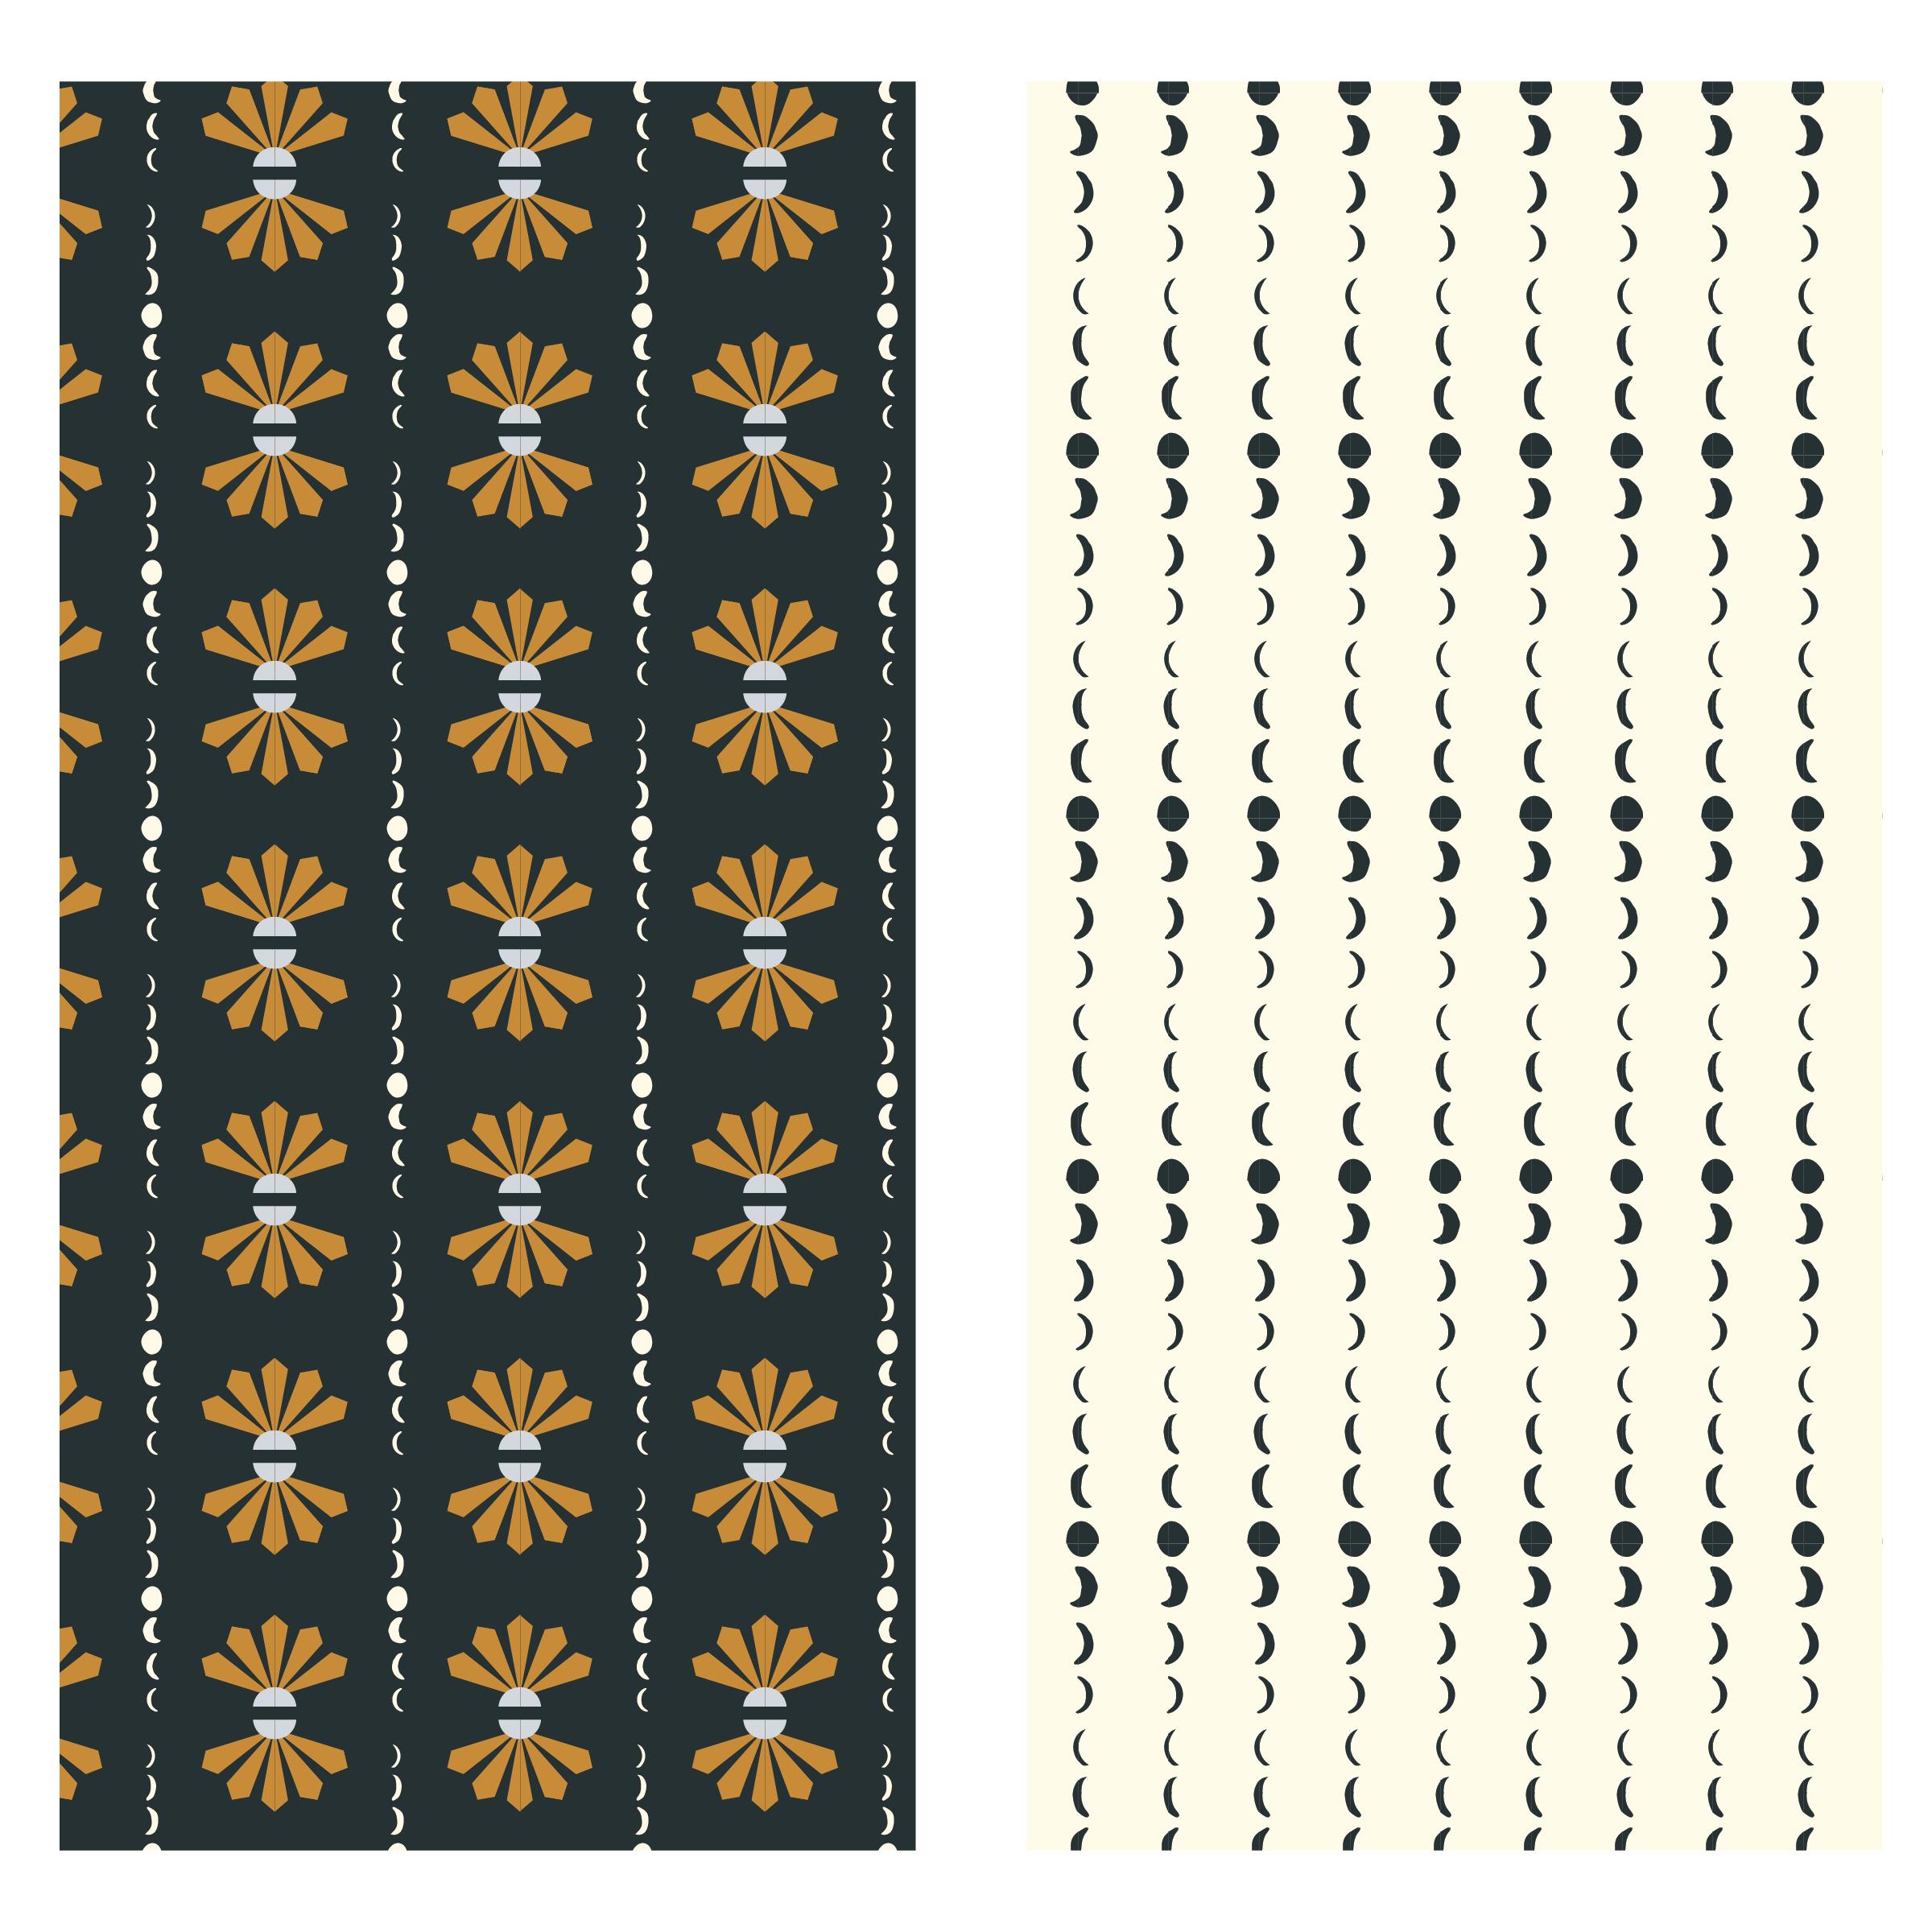 by HOPE johnson surface pattern design_pattern pair165.jpg